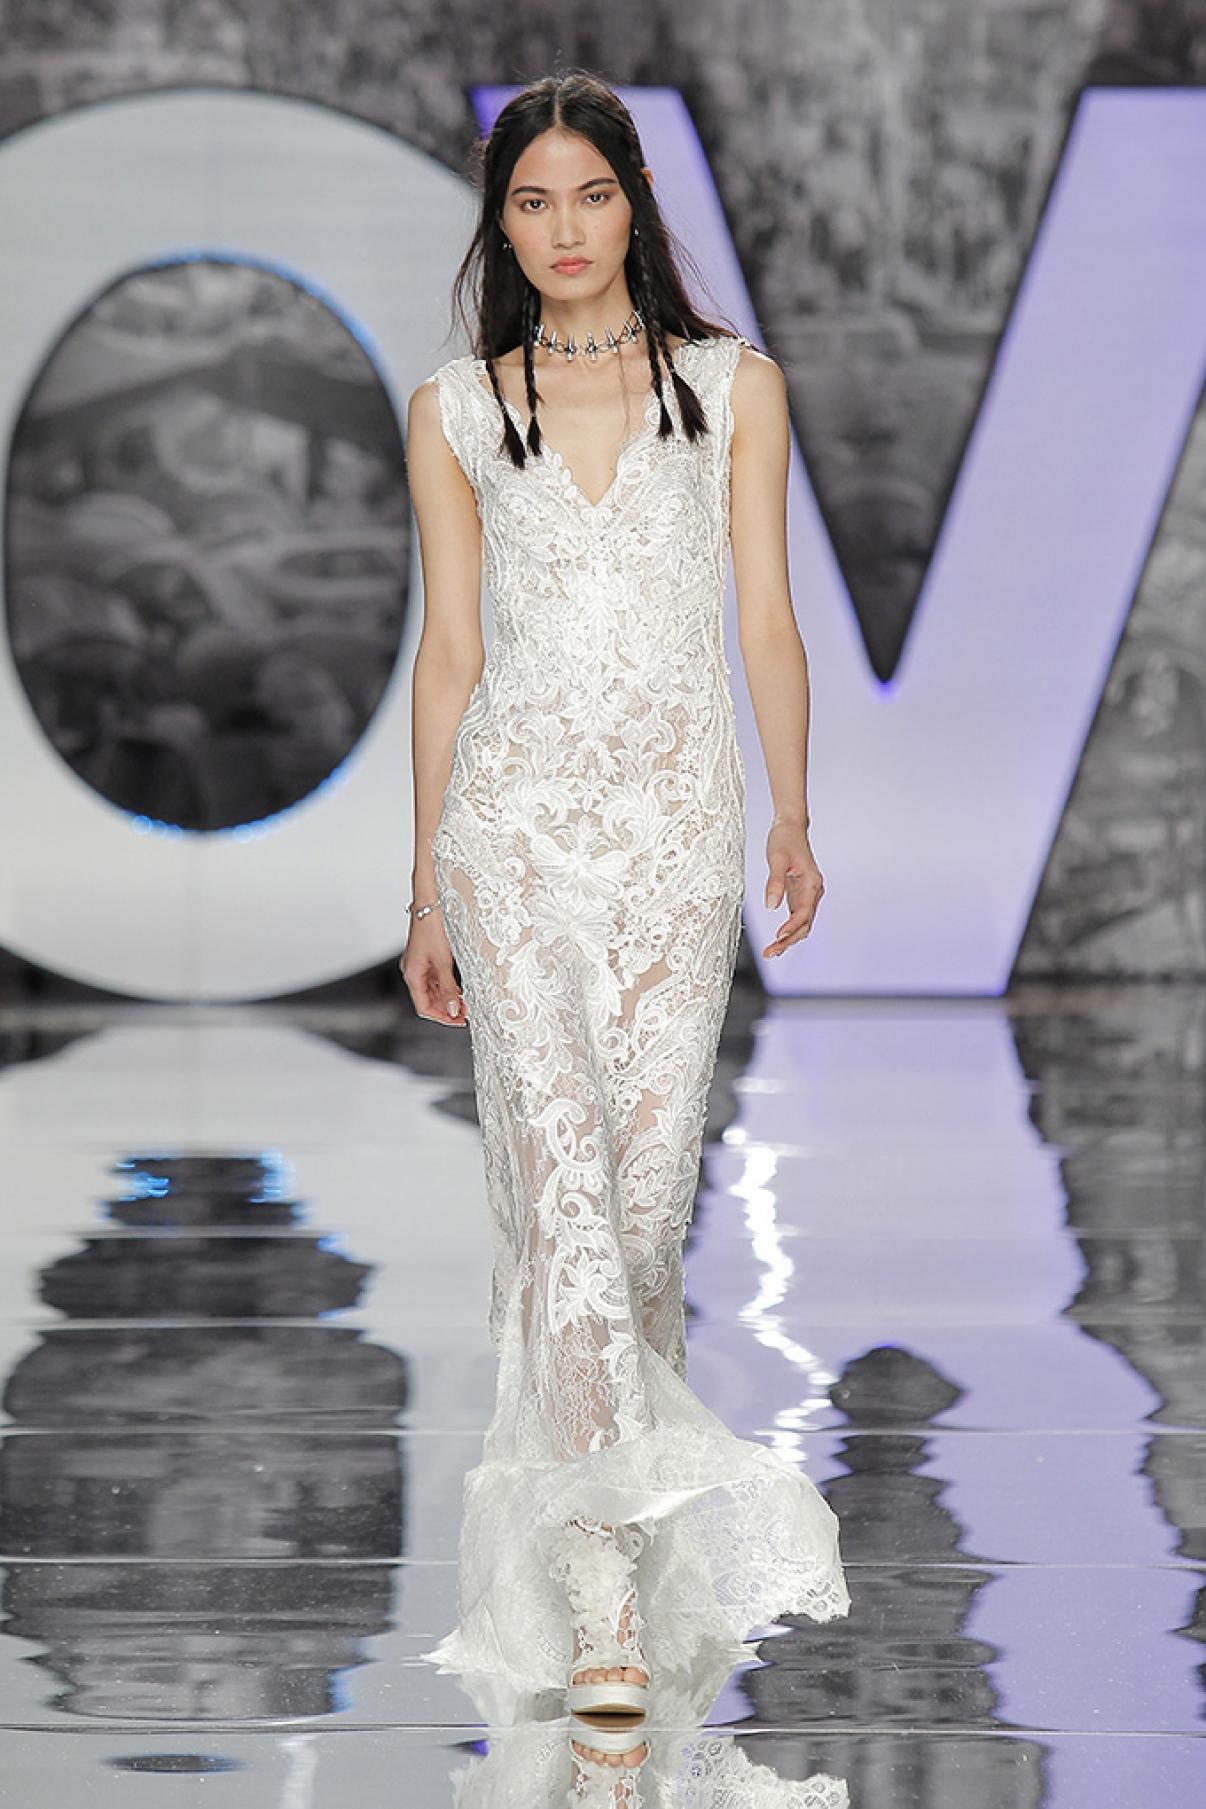 yolancris-weddingdress-bride-boho-chic-folk-wedding-dress-couture-fashion-desing-bohodress-13.jpg